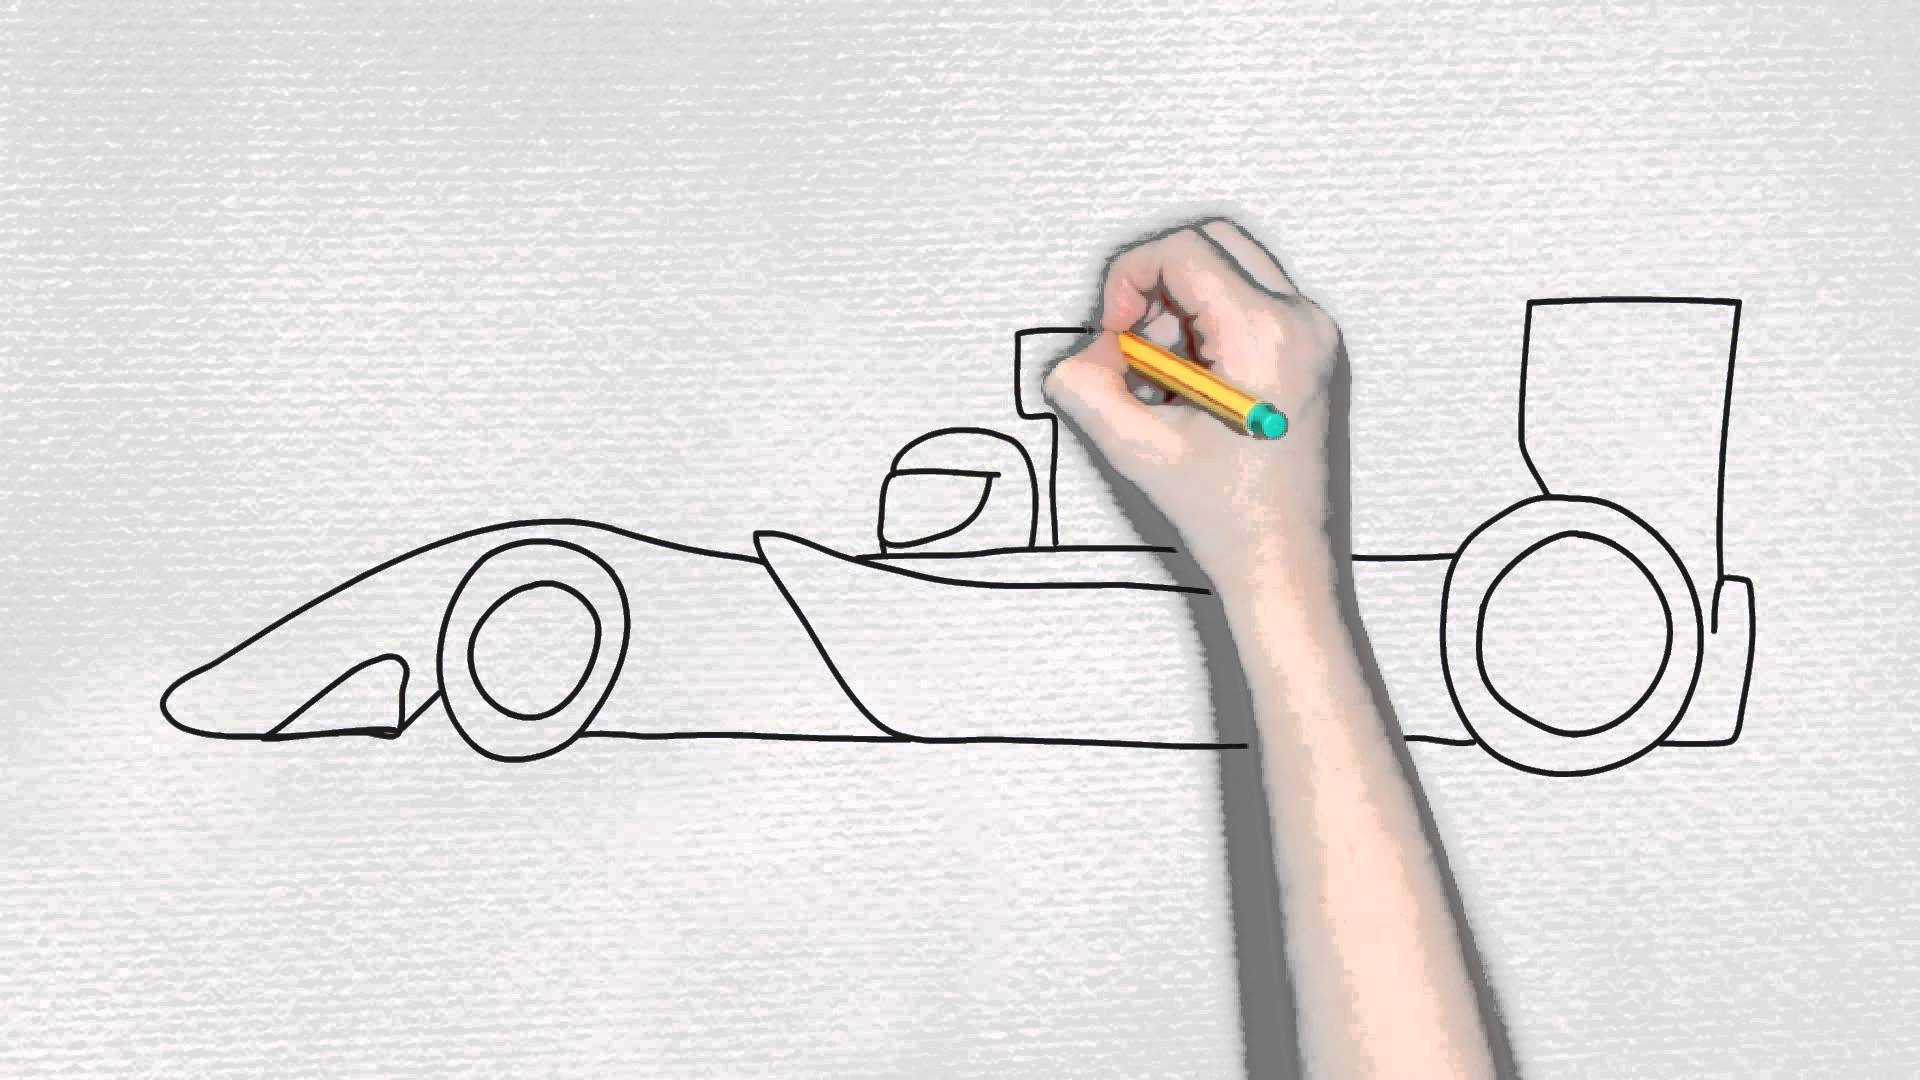 car drawings in pencil wallpapers 41 wallpapers u2013 adorable